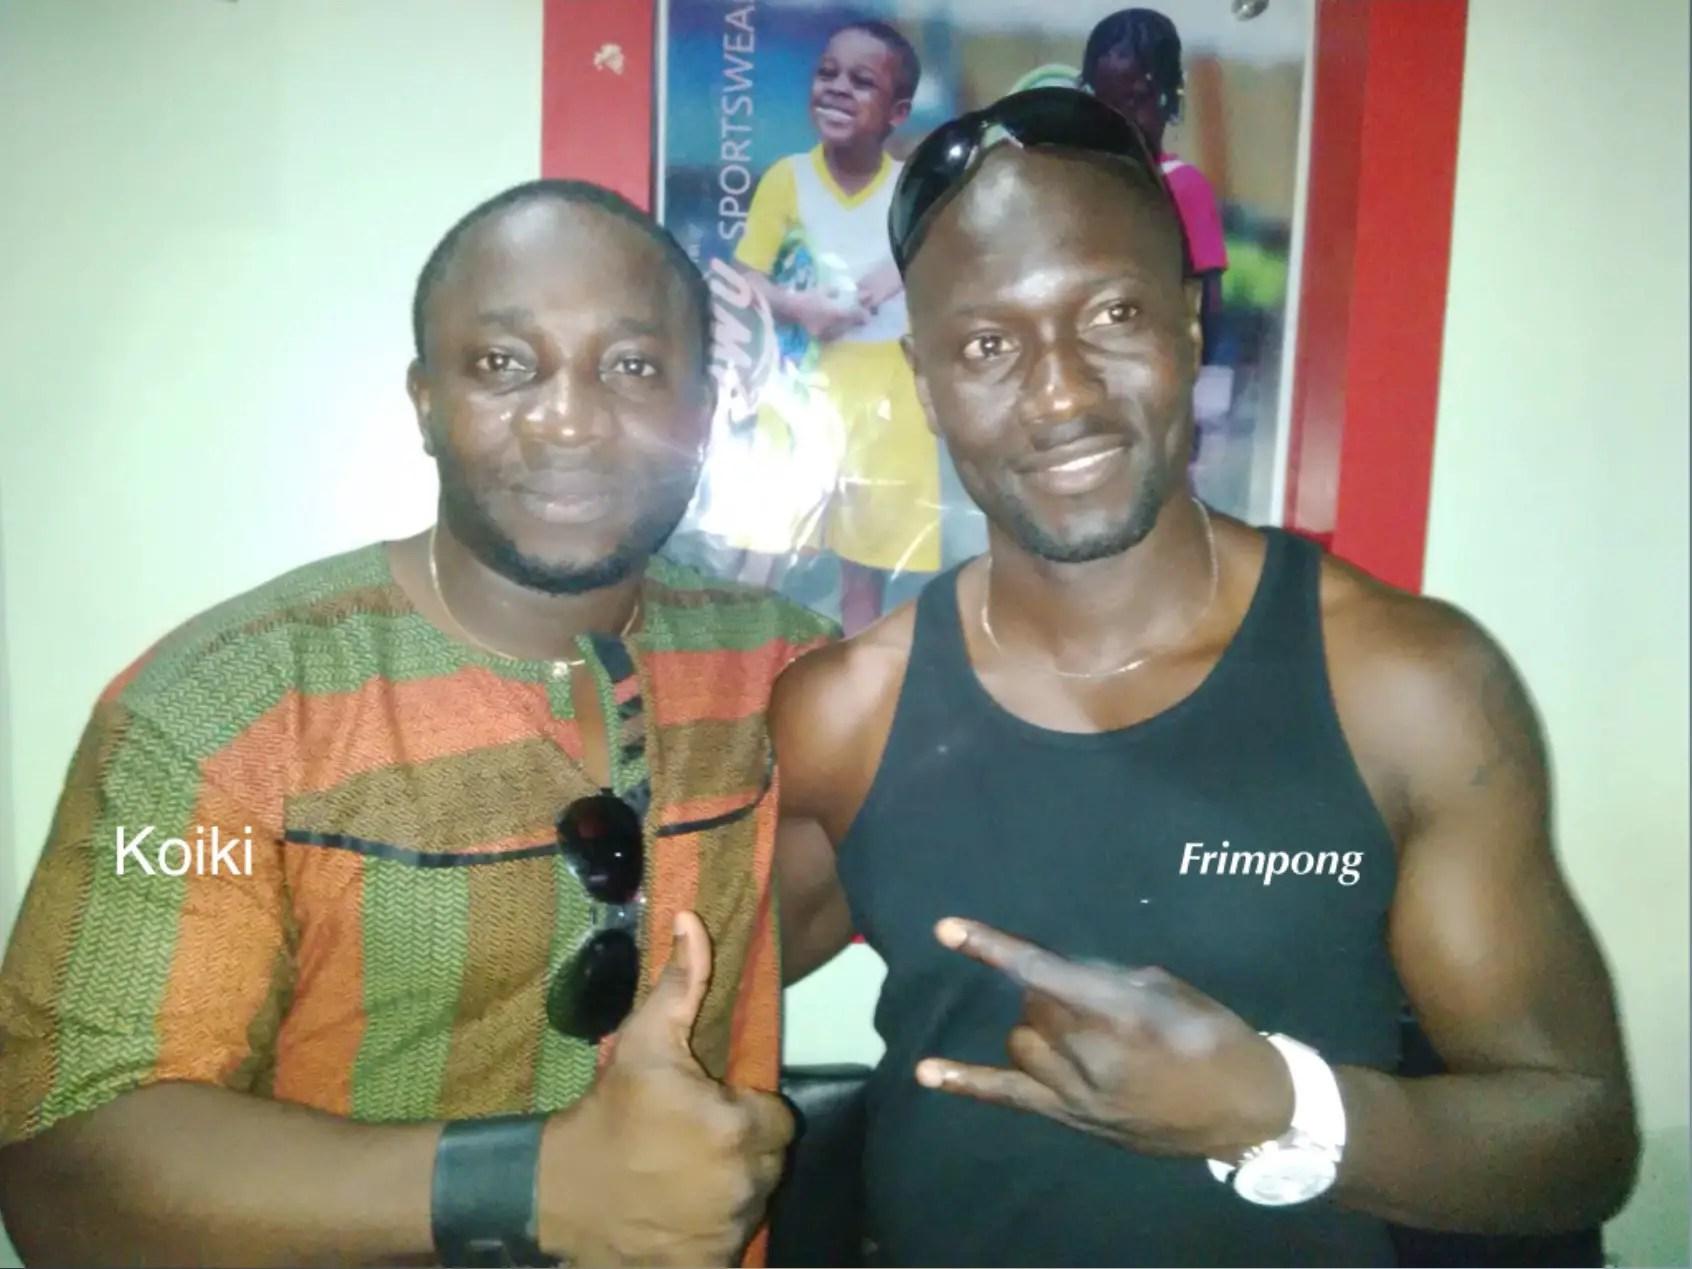 Joetex Frimpong: Nigerian League Made Me, I Am A Ghanaian-Nigerian